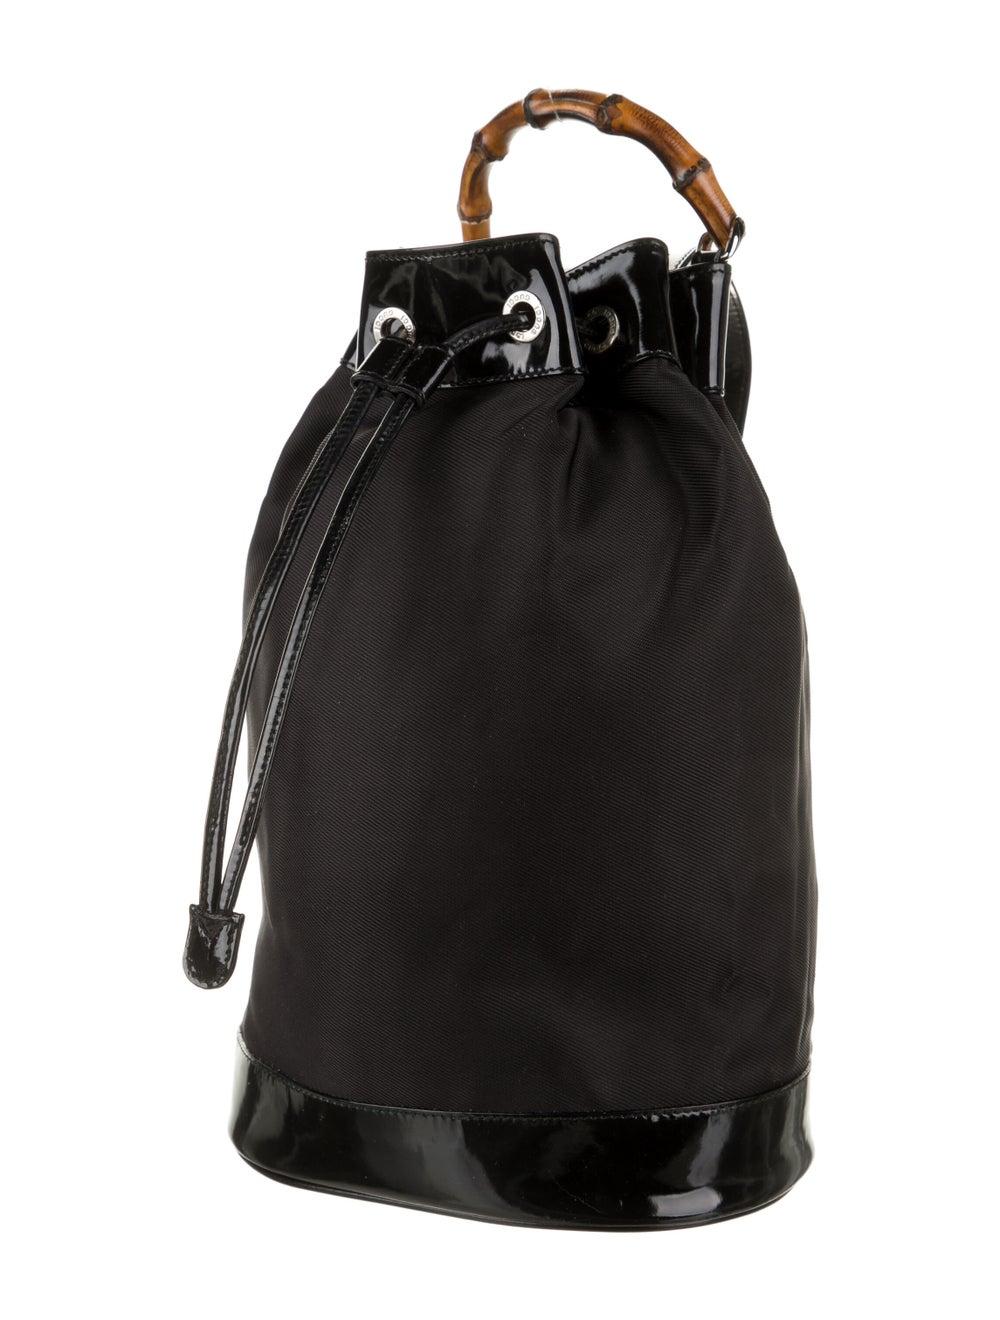 Gucci Vintage Bamboo Nylon Sling Bag Black - image 3